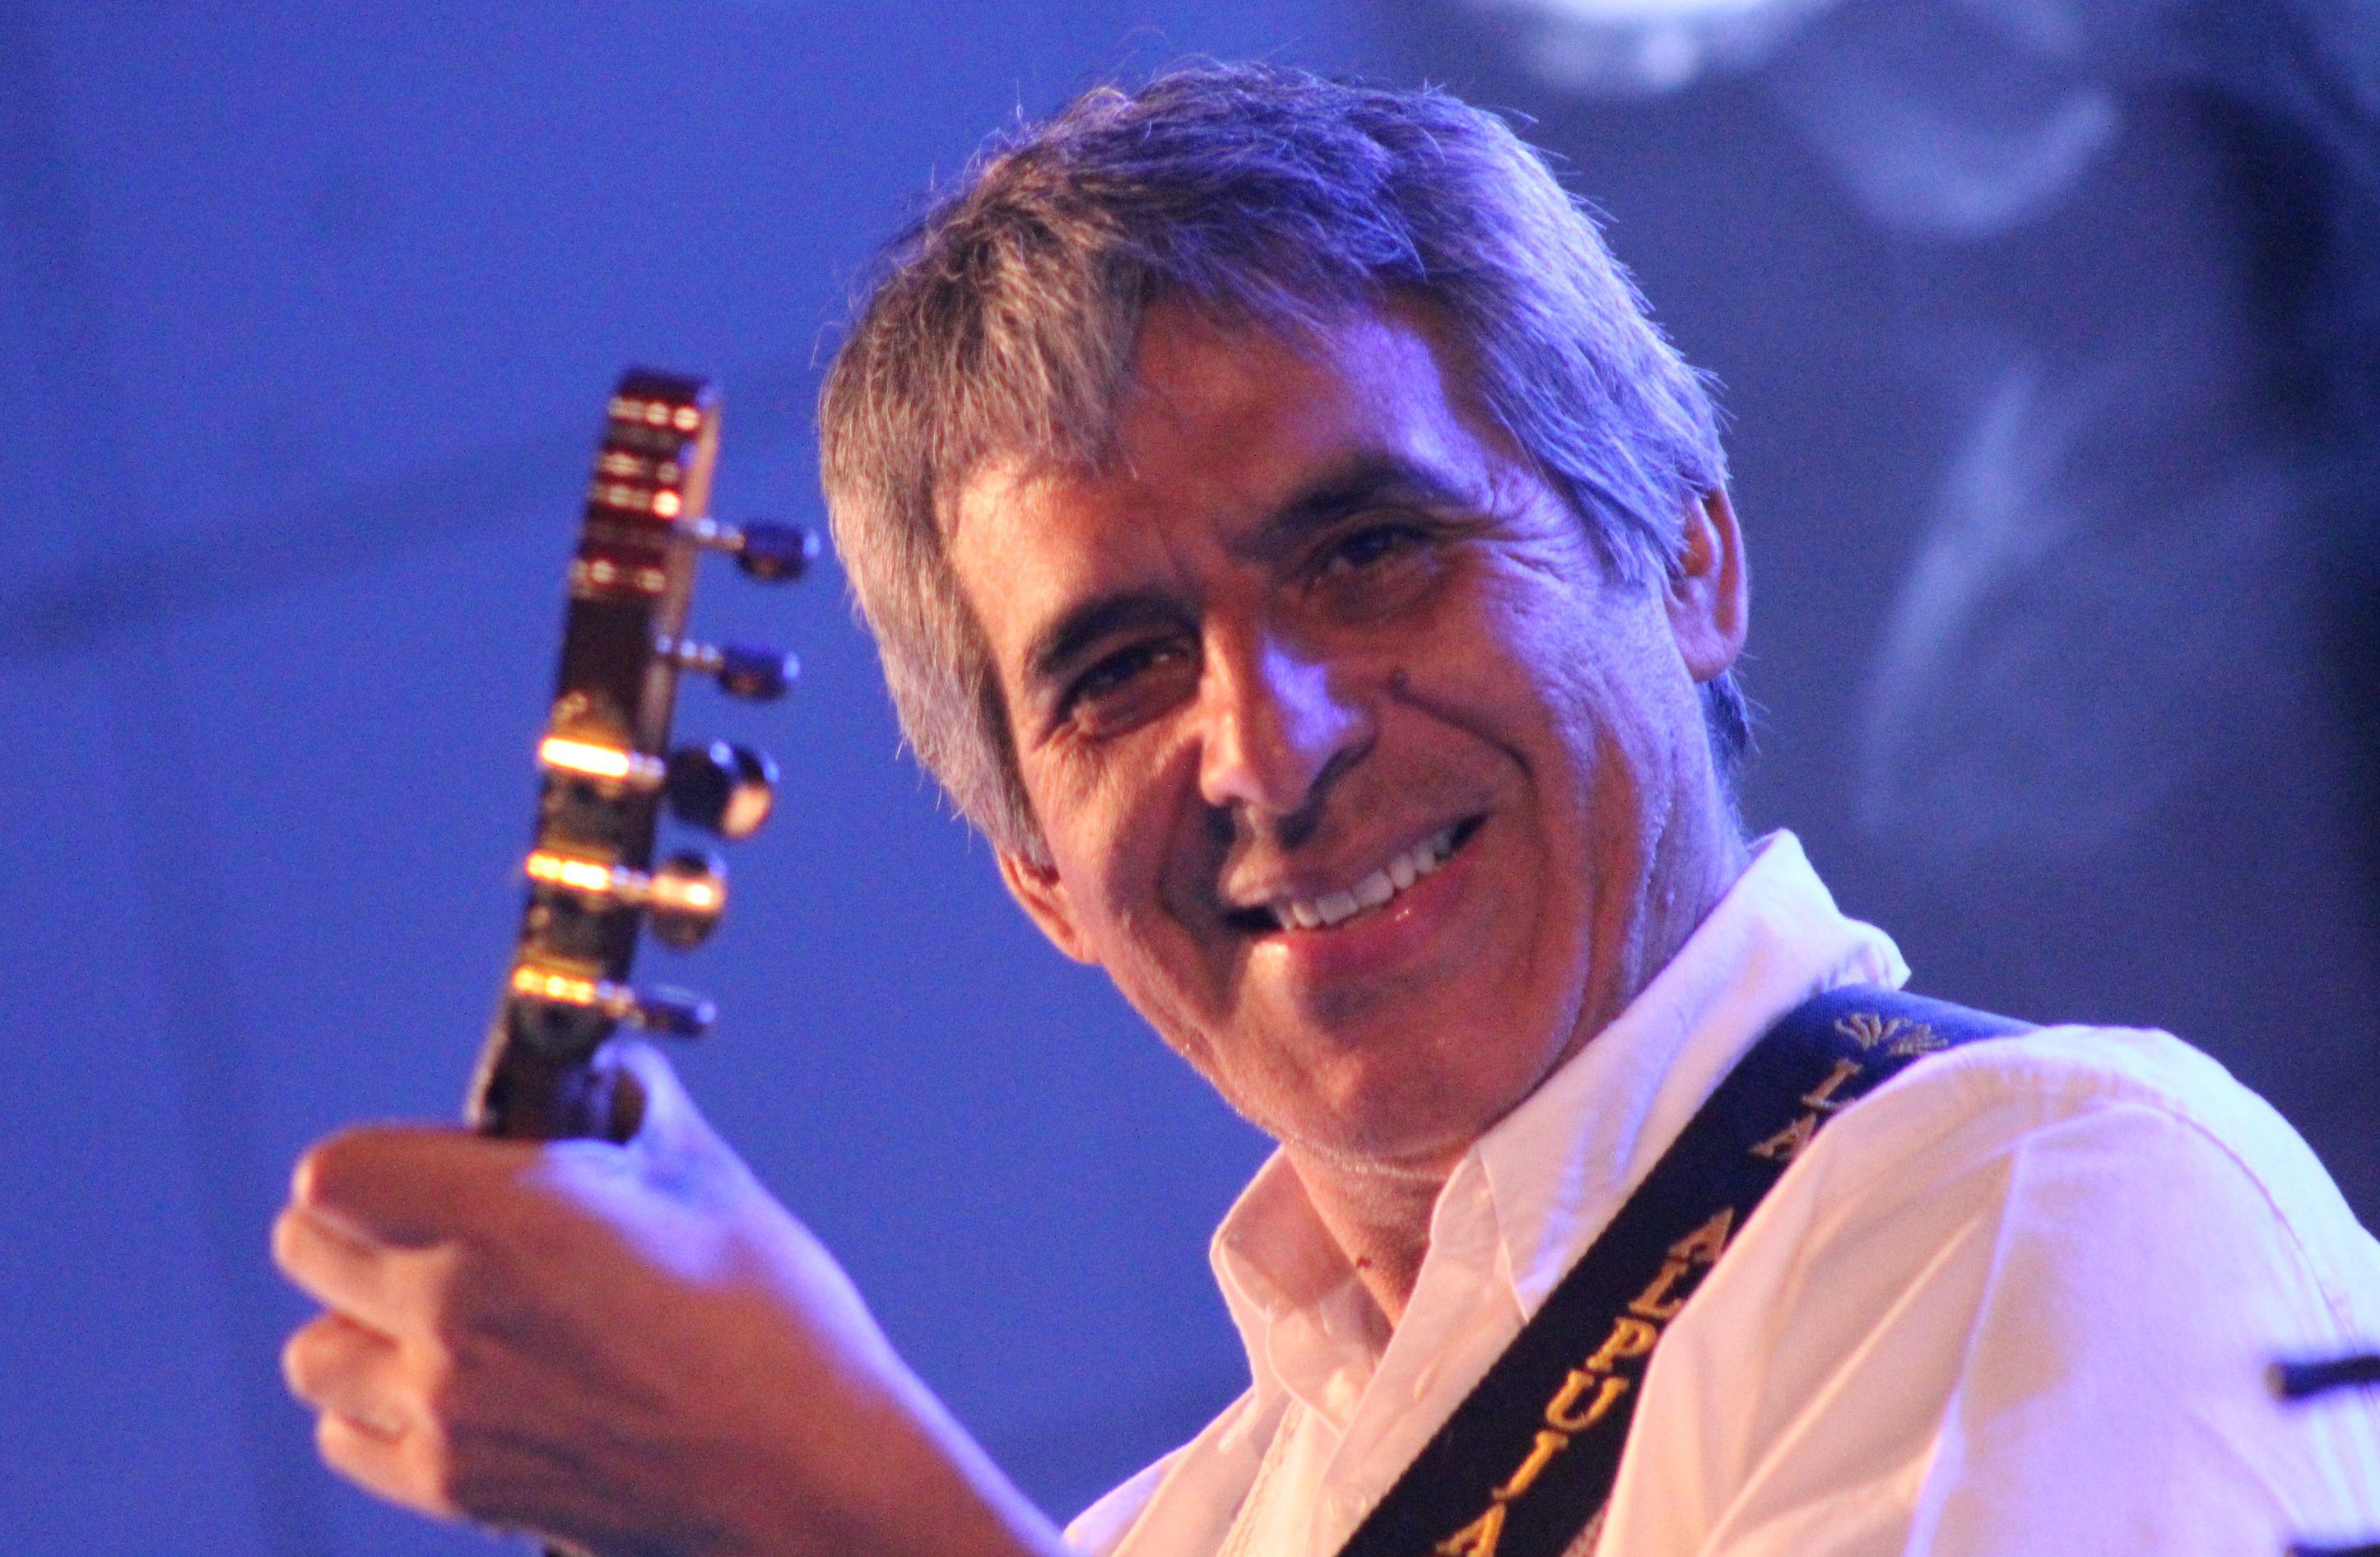 Contratar a Peteco Carabajal: http://worldmusicba.com/contratar-a-peteco-carabajal/